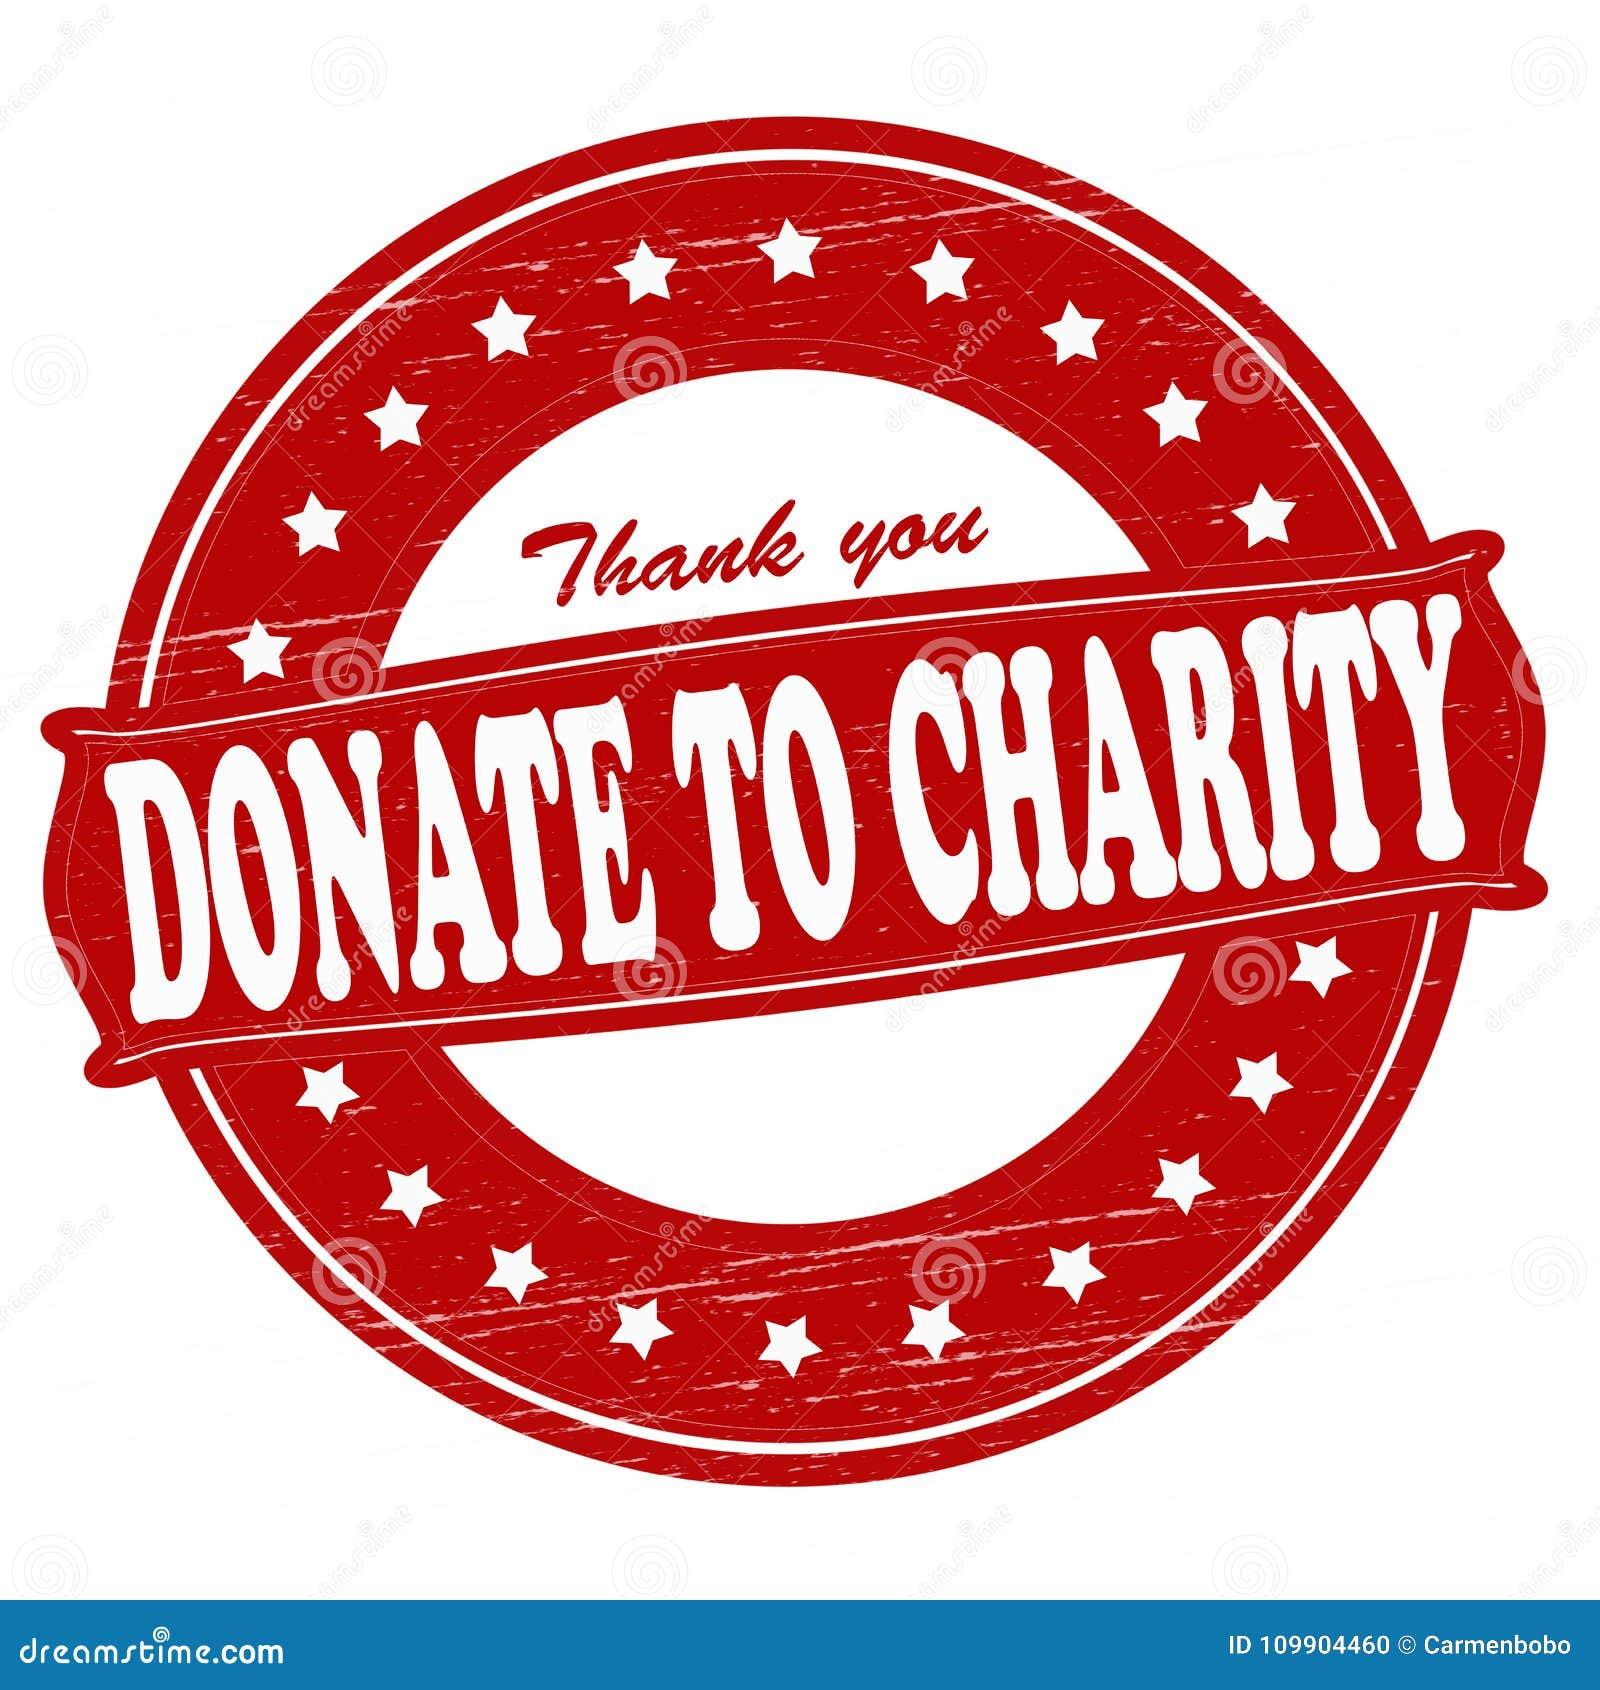 FDonate à caridade